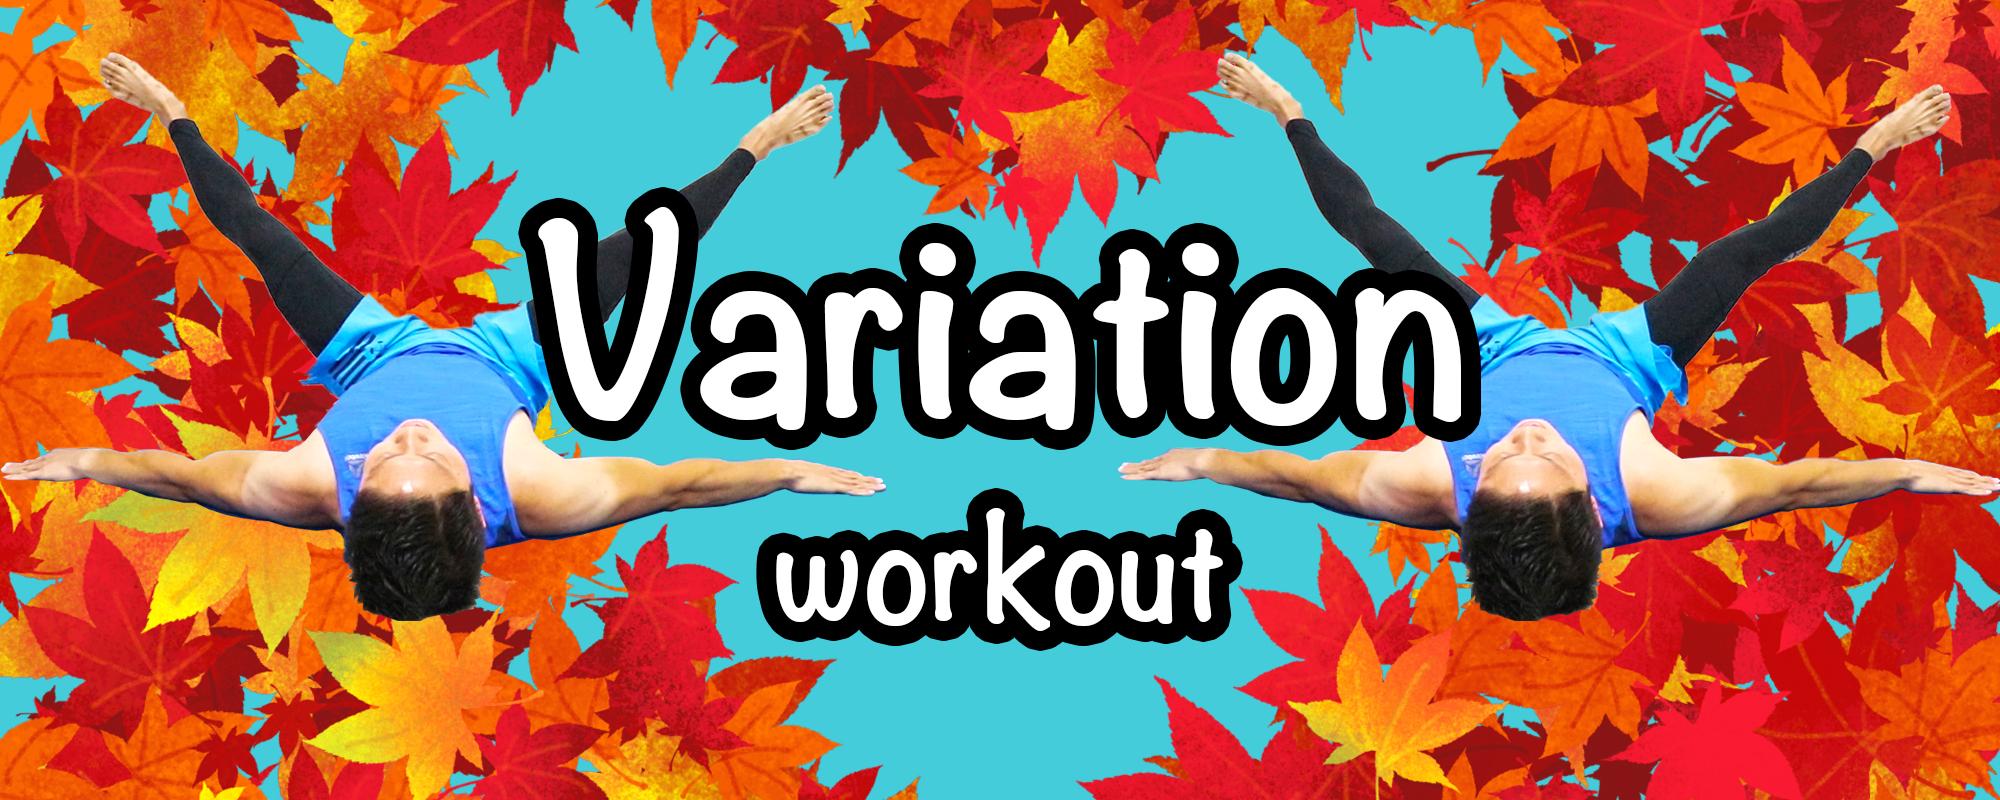 Variation 4 weeks program